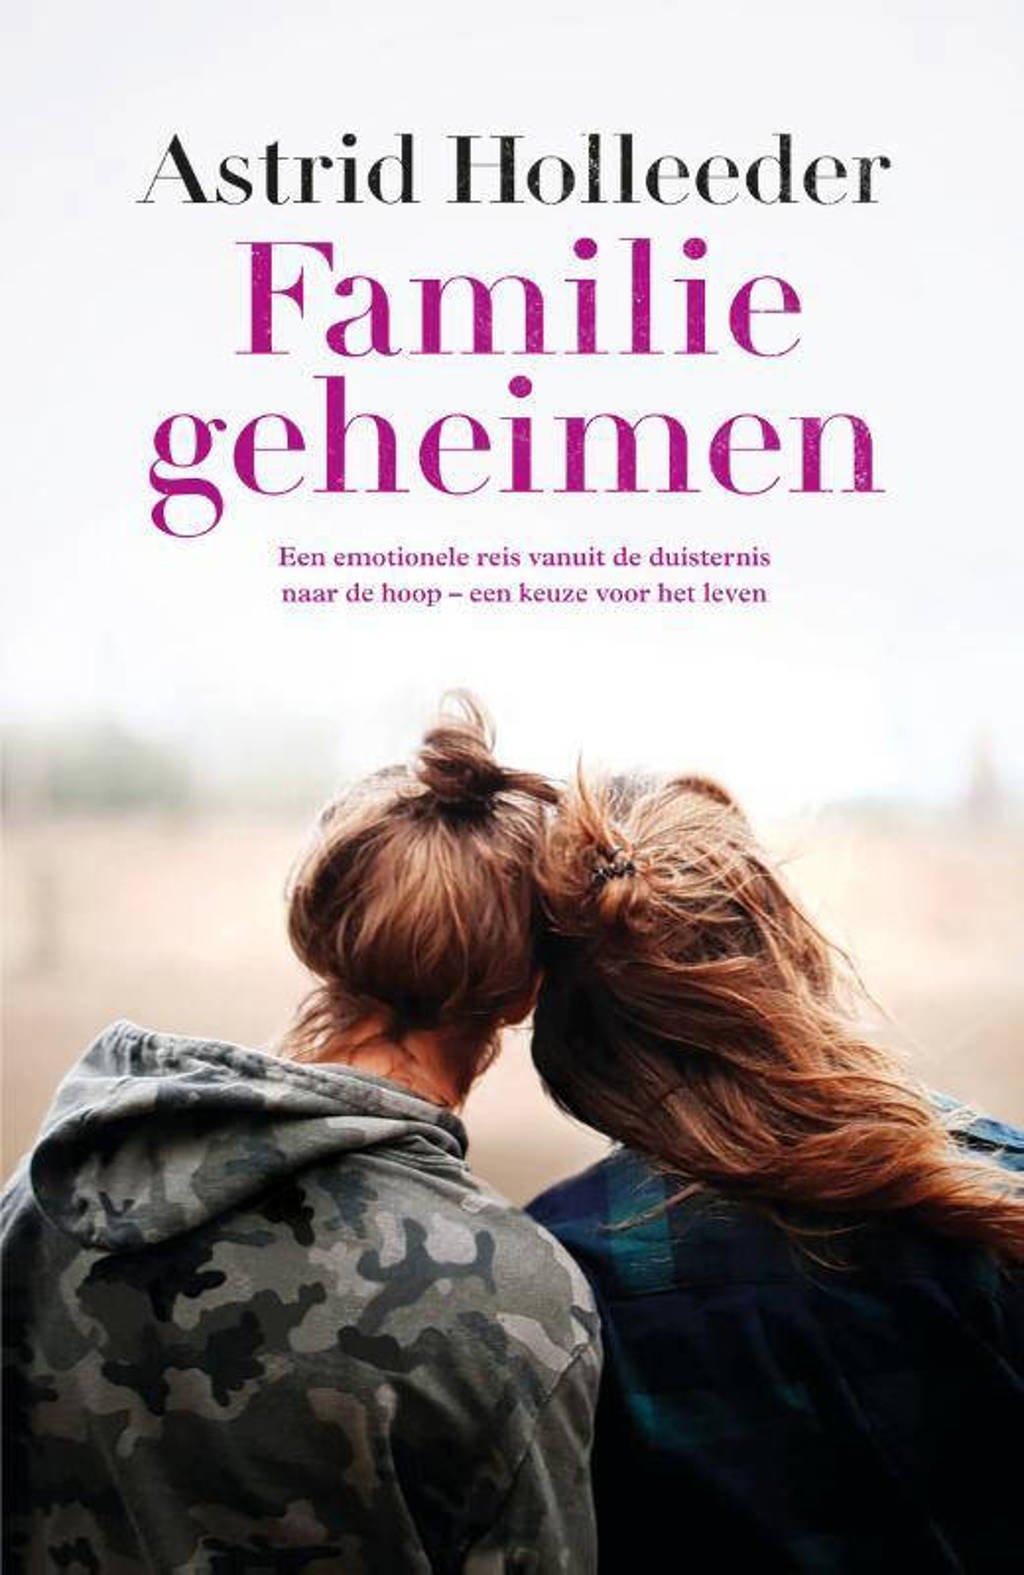 De Holleeder trilogie: Familiegeheimen - Astrid Holleeder